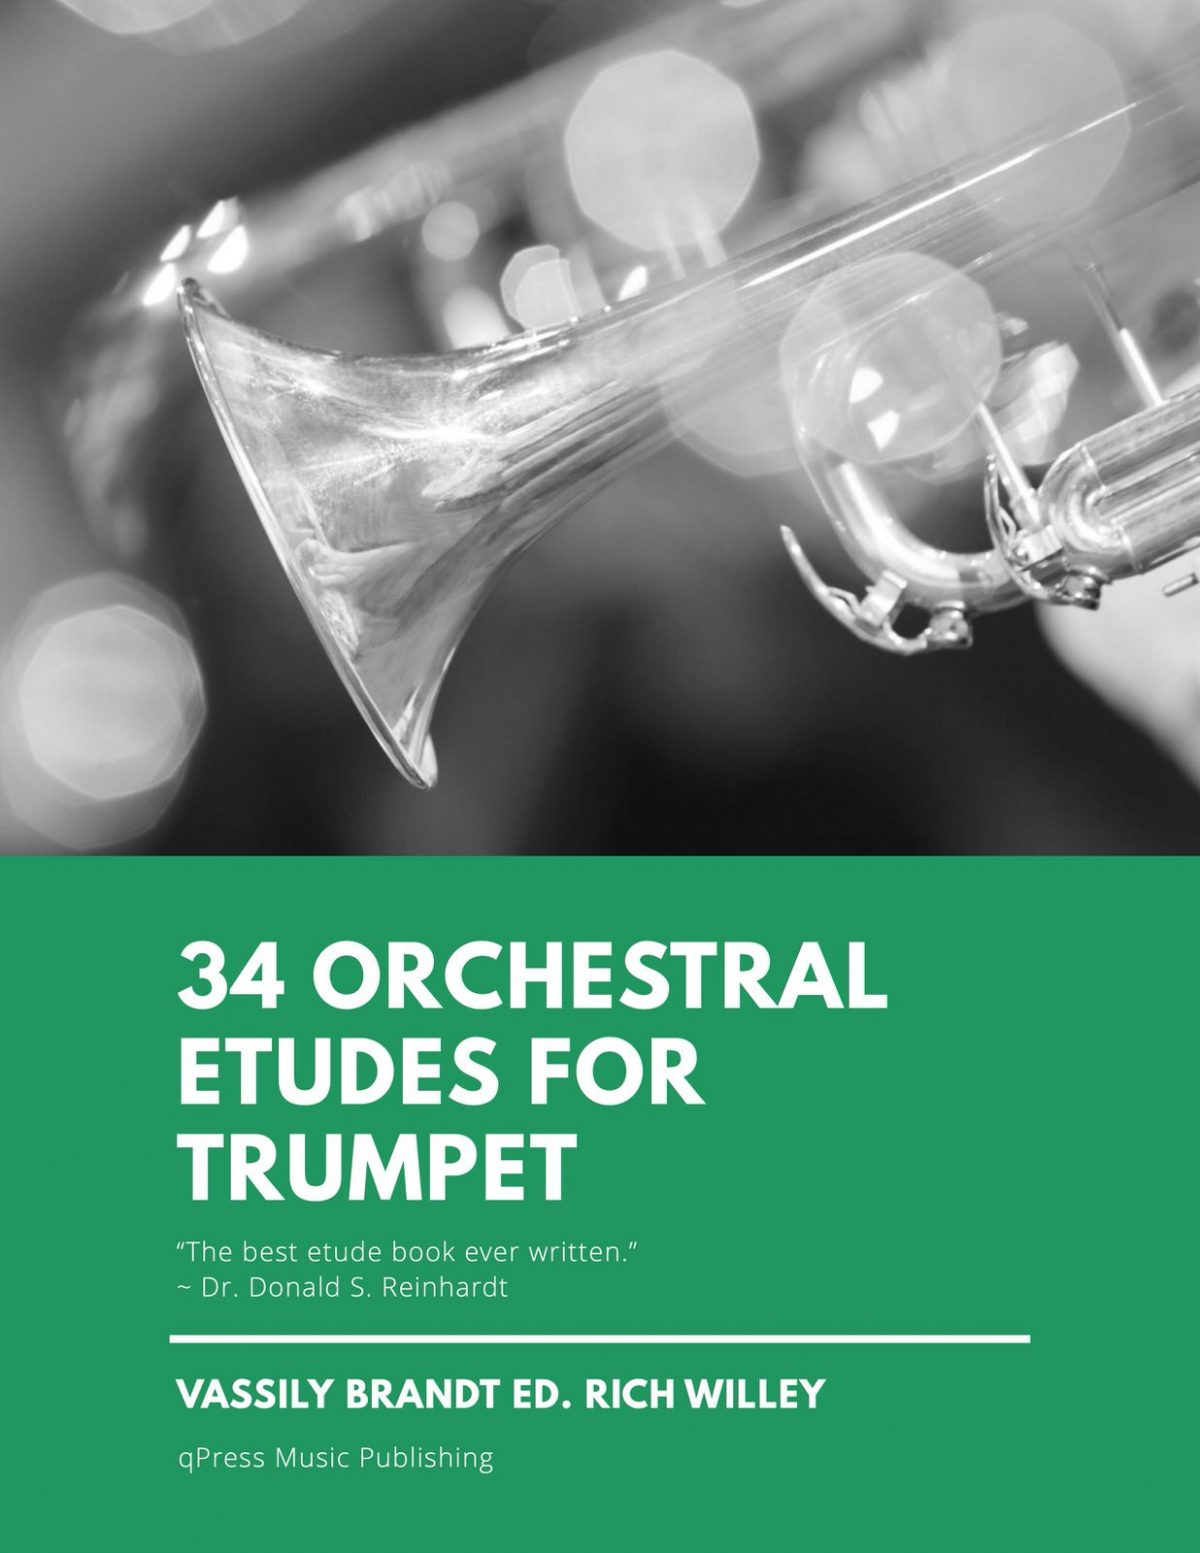 Brandt, 34 Orchestral Etudes for Trumpet-p01